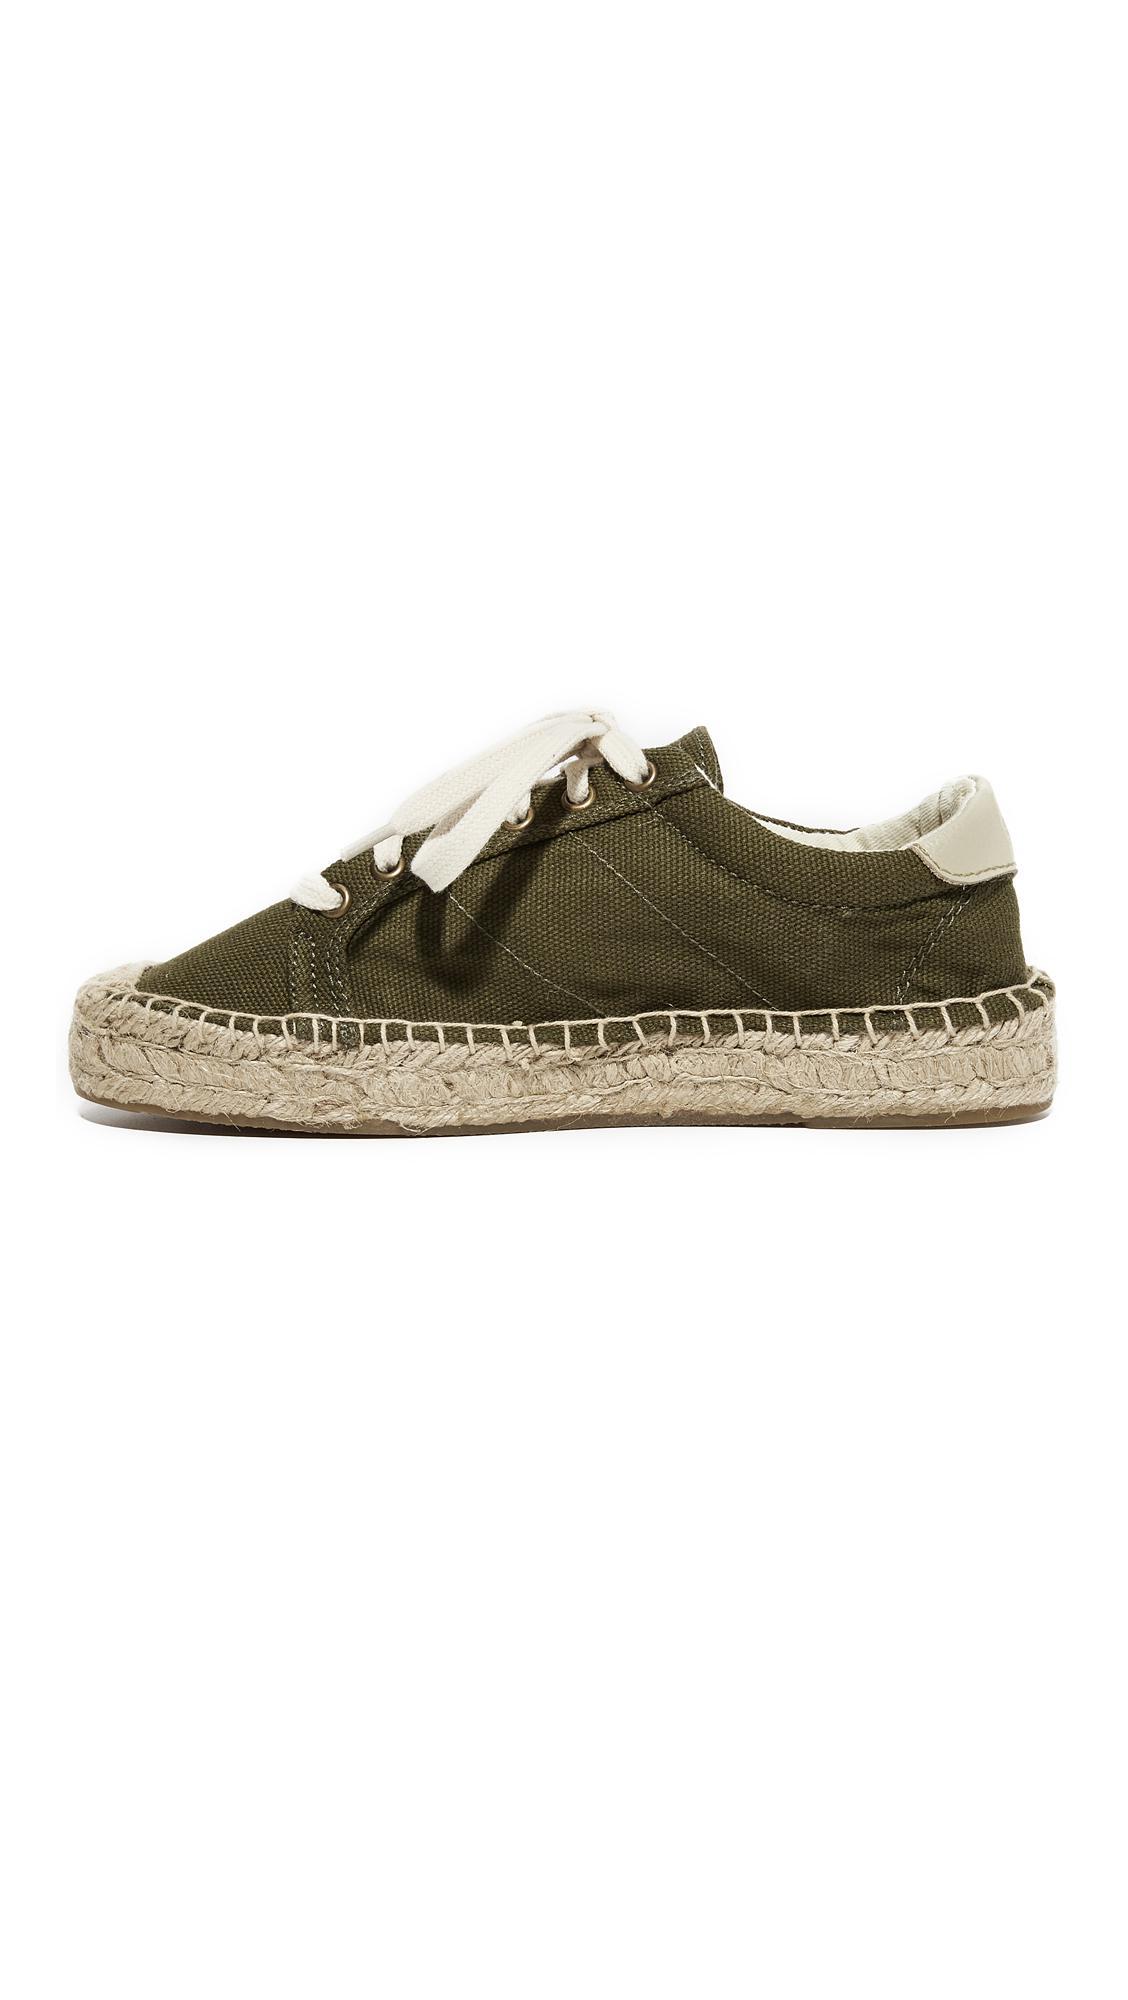 Soludos Canvas Platform Tennis Sneakers in Camo Green (Green)